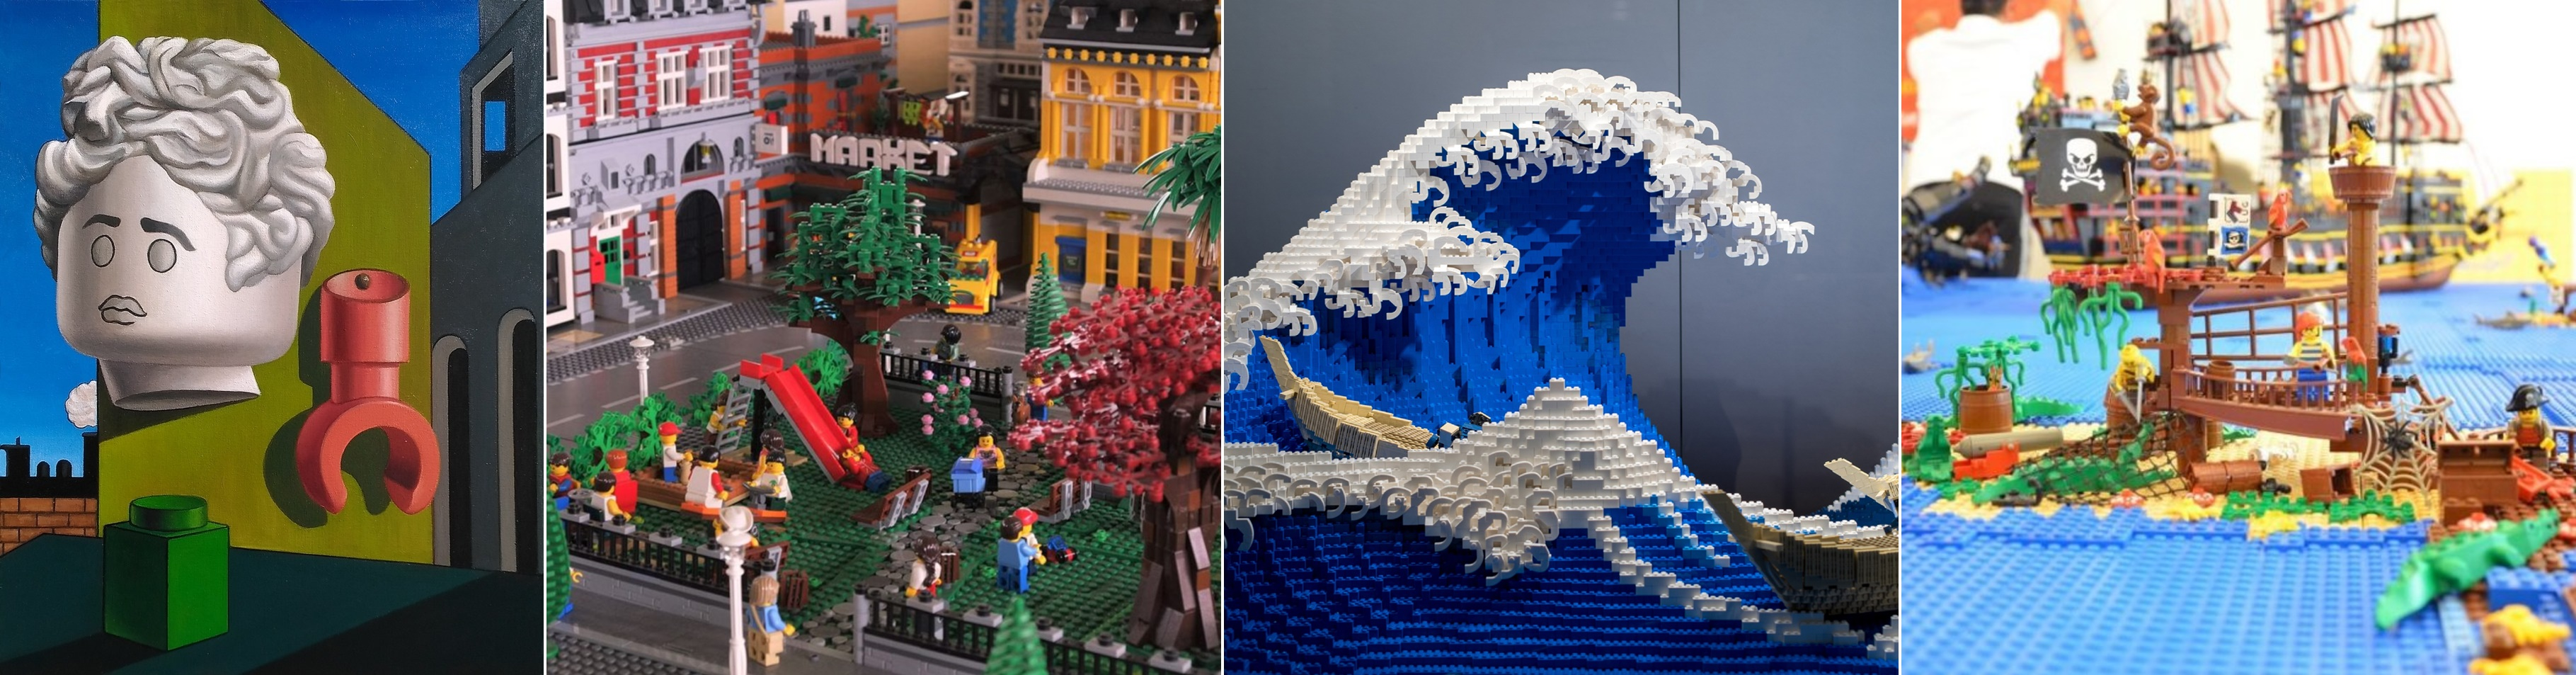 Mostra I love Lego 650